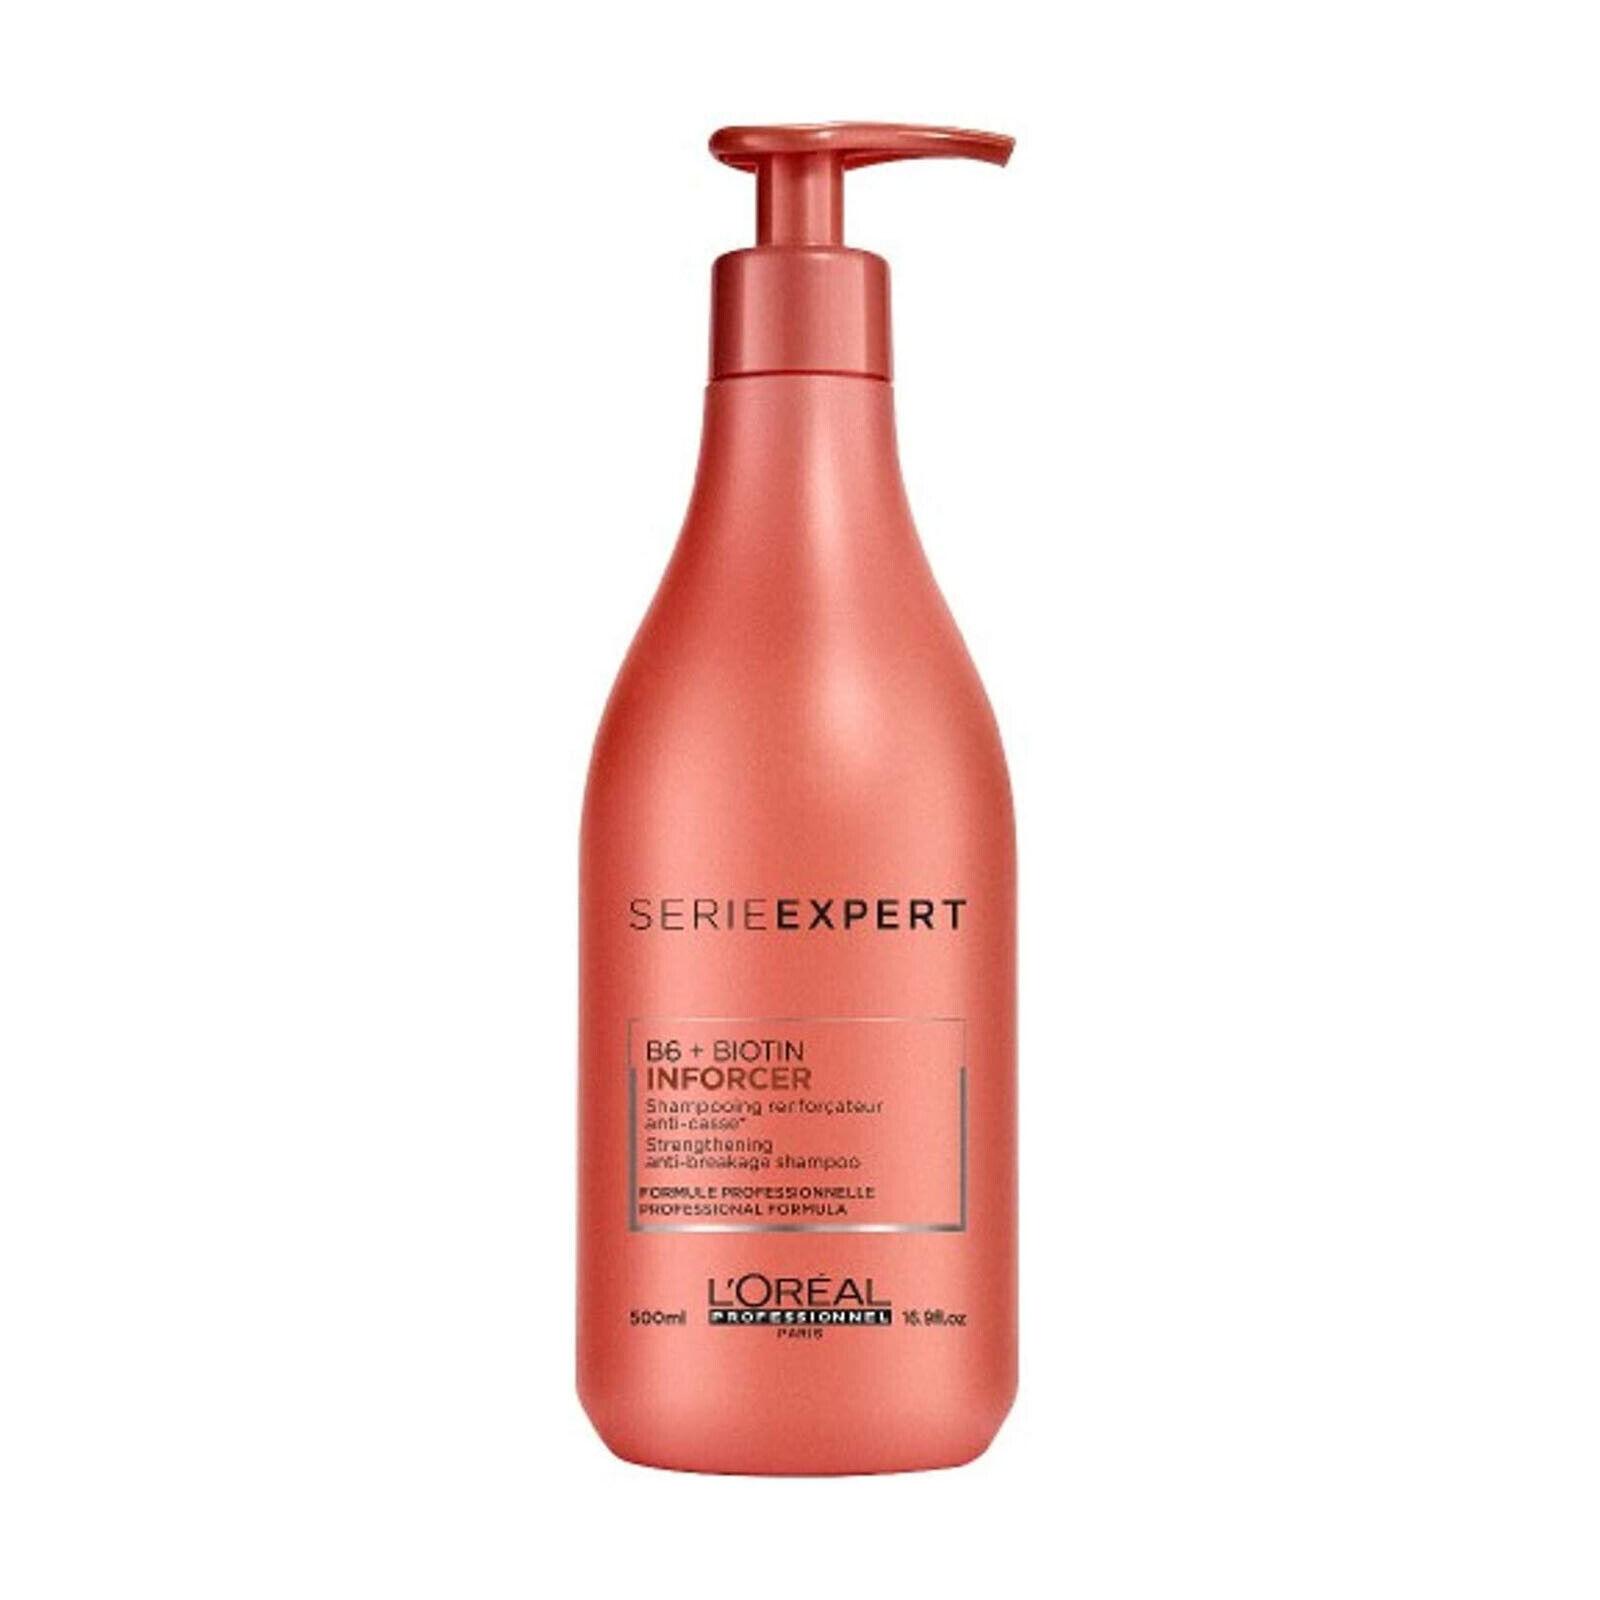 Loreal Serie Expert B6 + Biotin Inforcer Shampoo gegen Haarbruch 500 ml